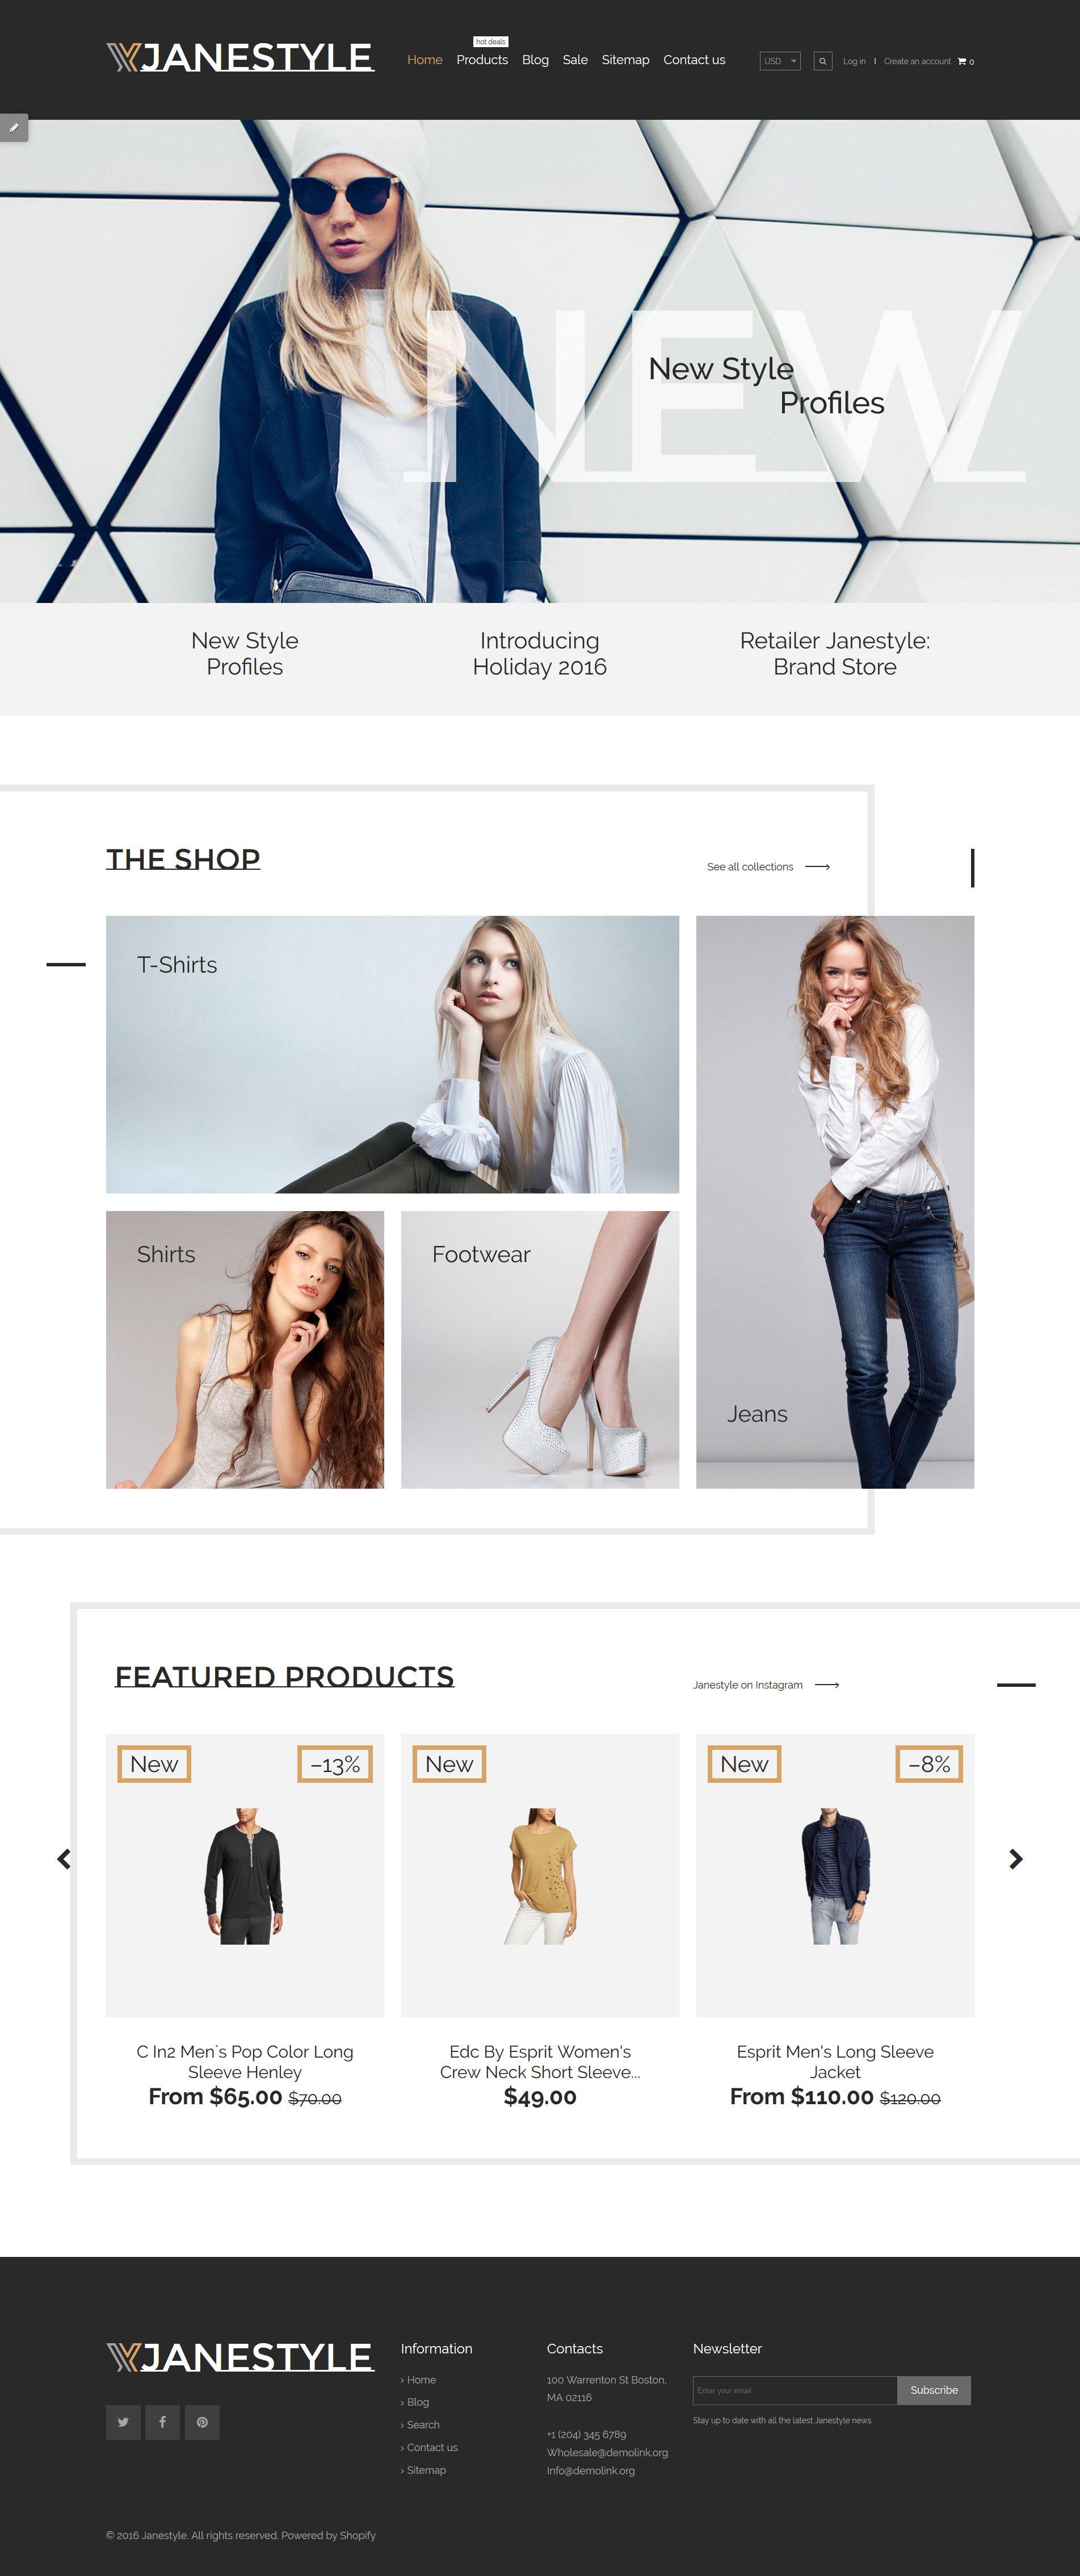 JaneStyle Shopify Theme - screenshot